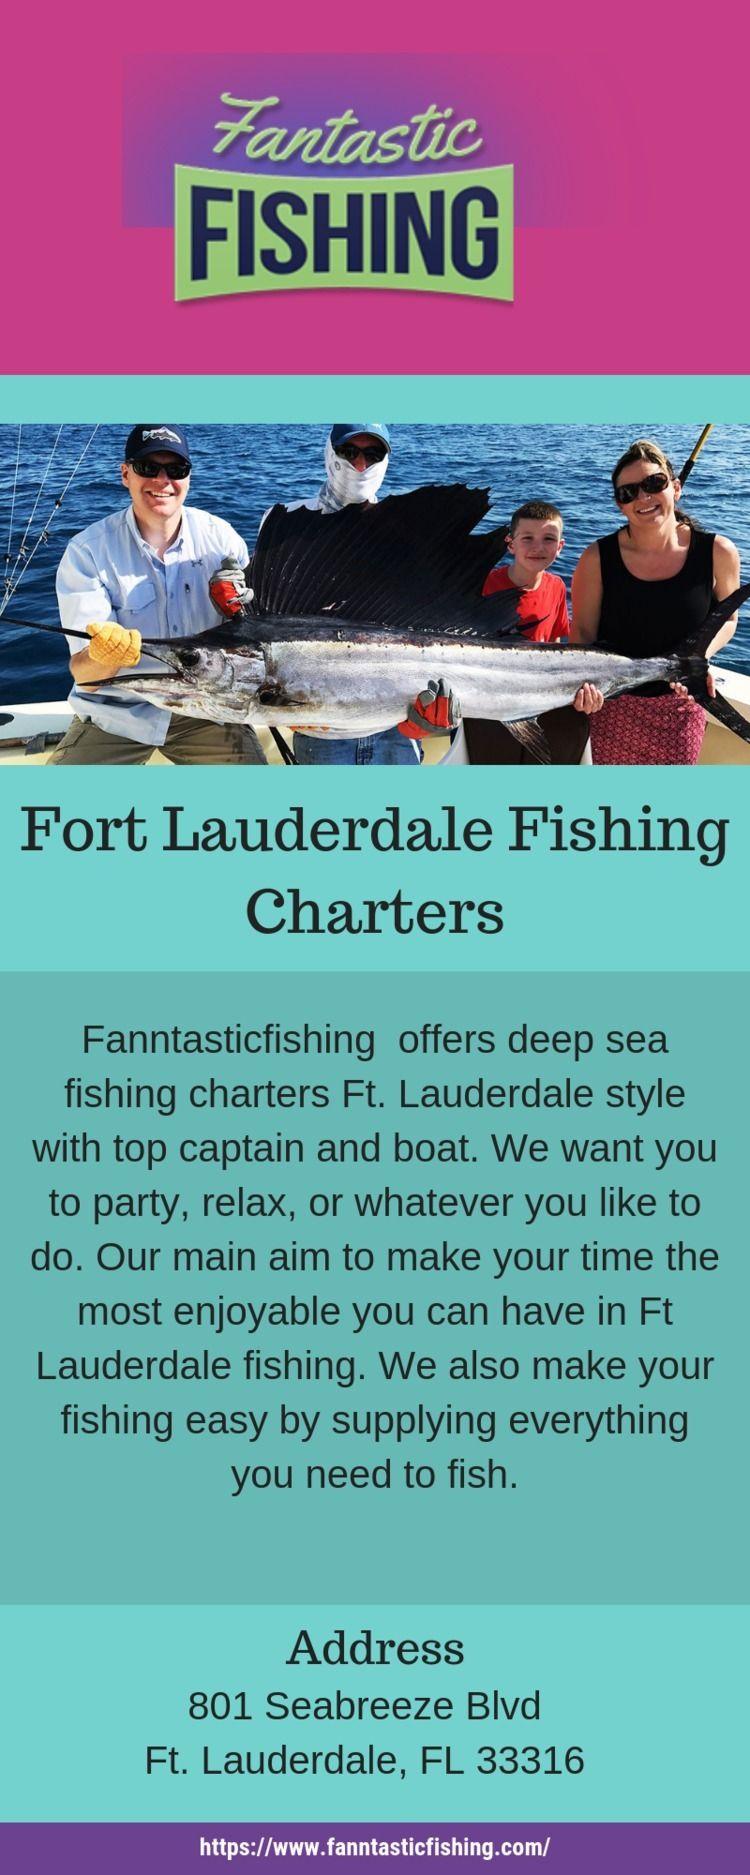 Charter Boats Fort Lauderdale?  - fanntasticfishing | ello